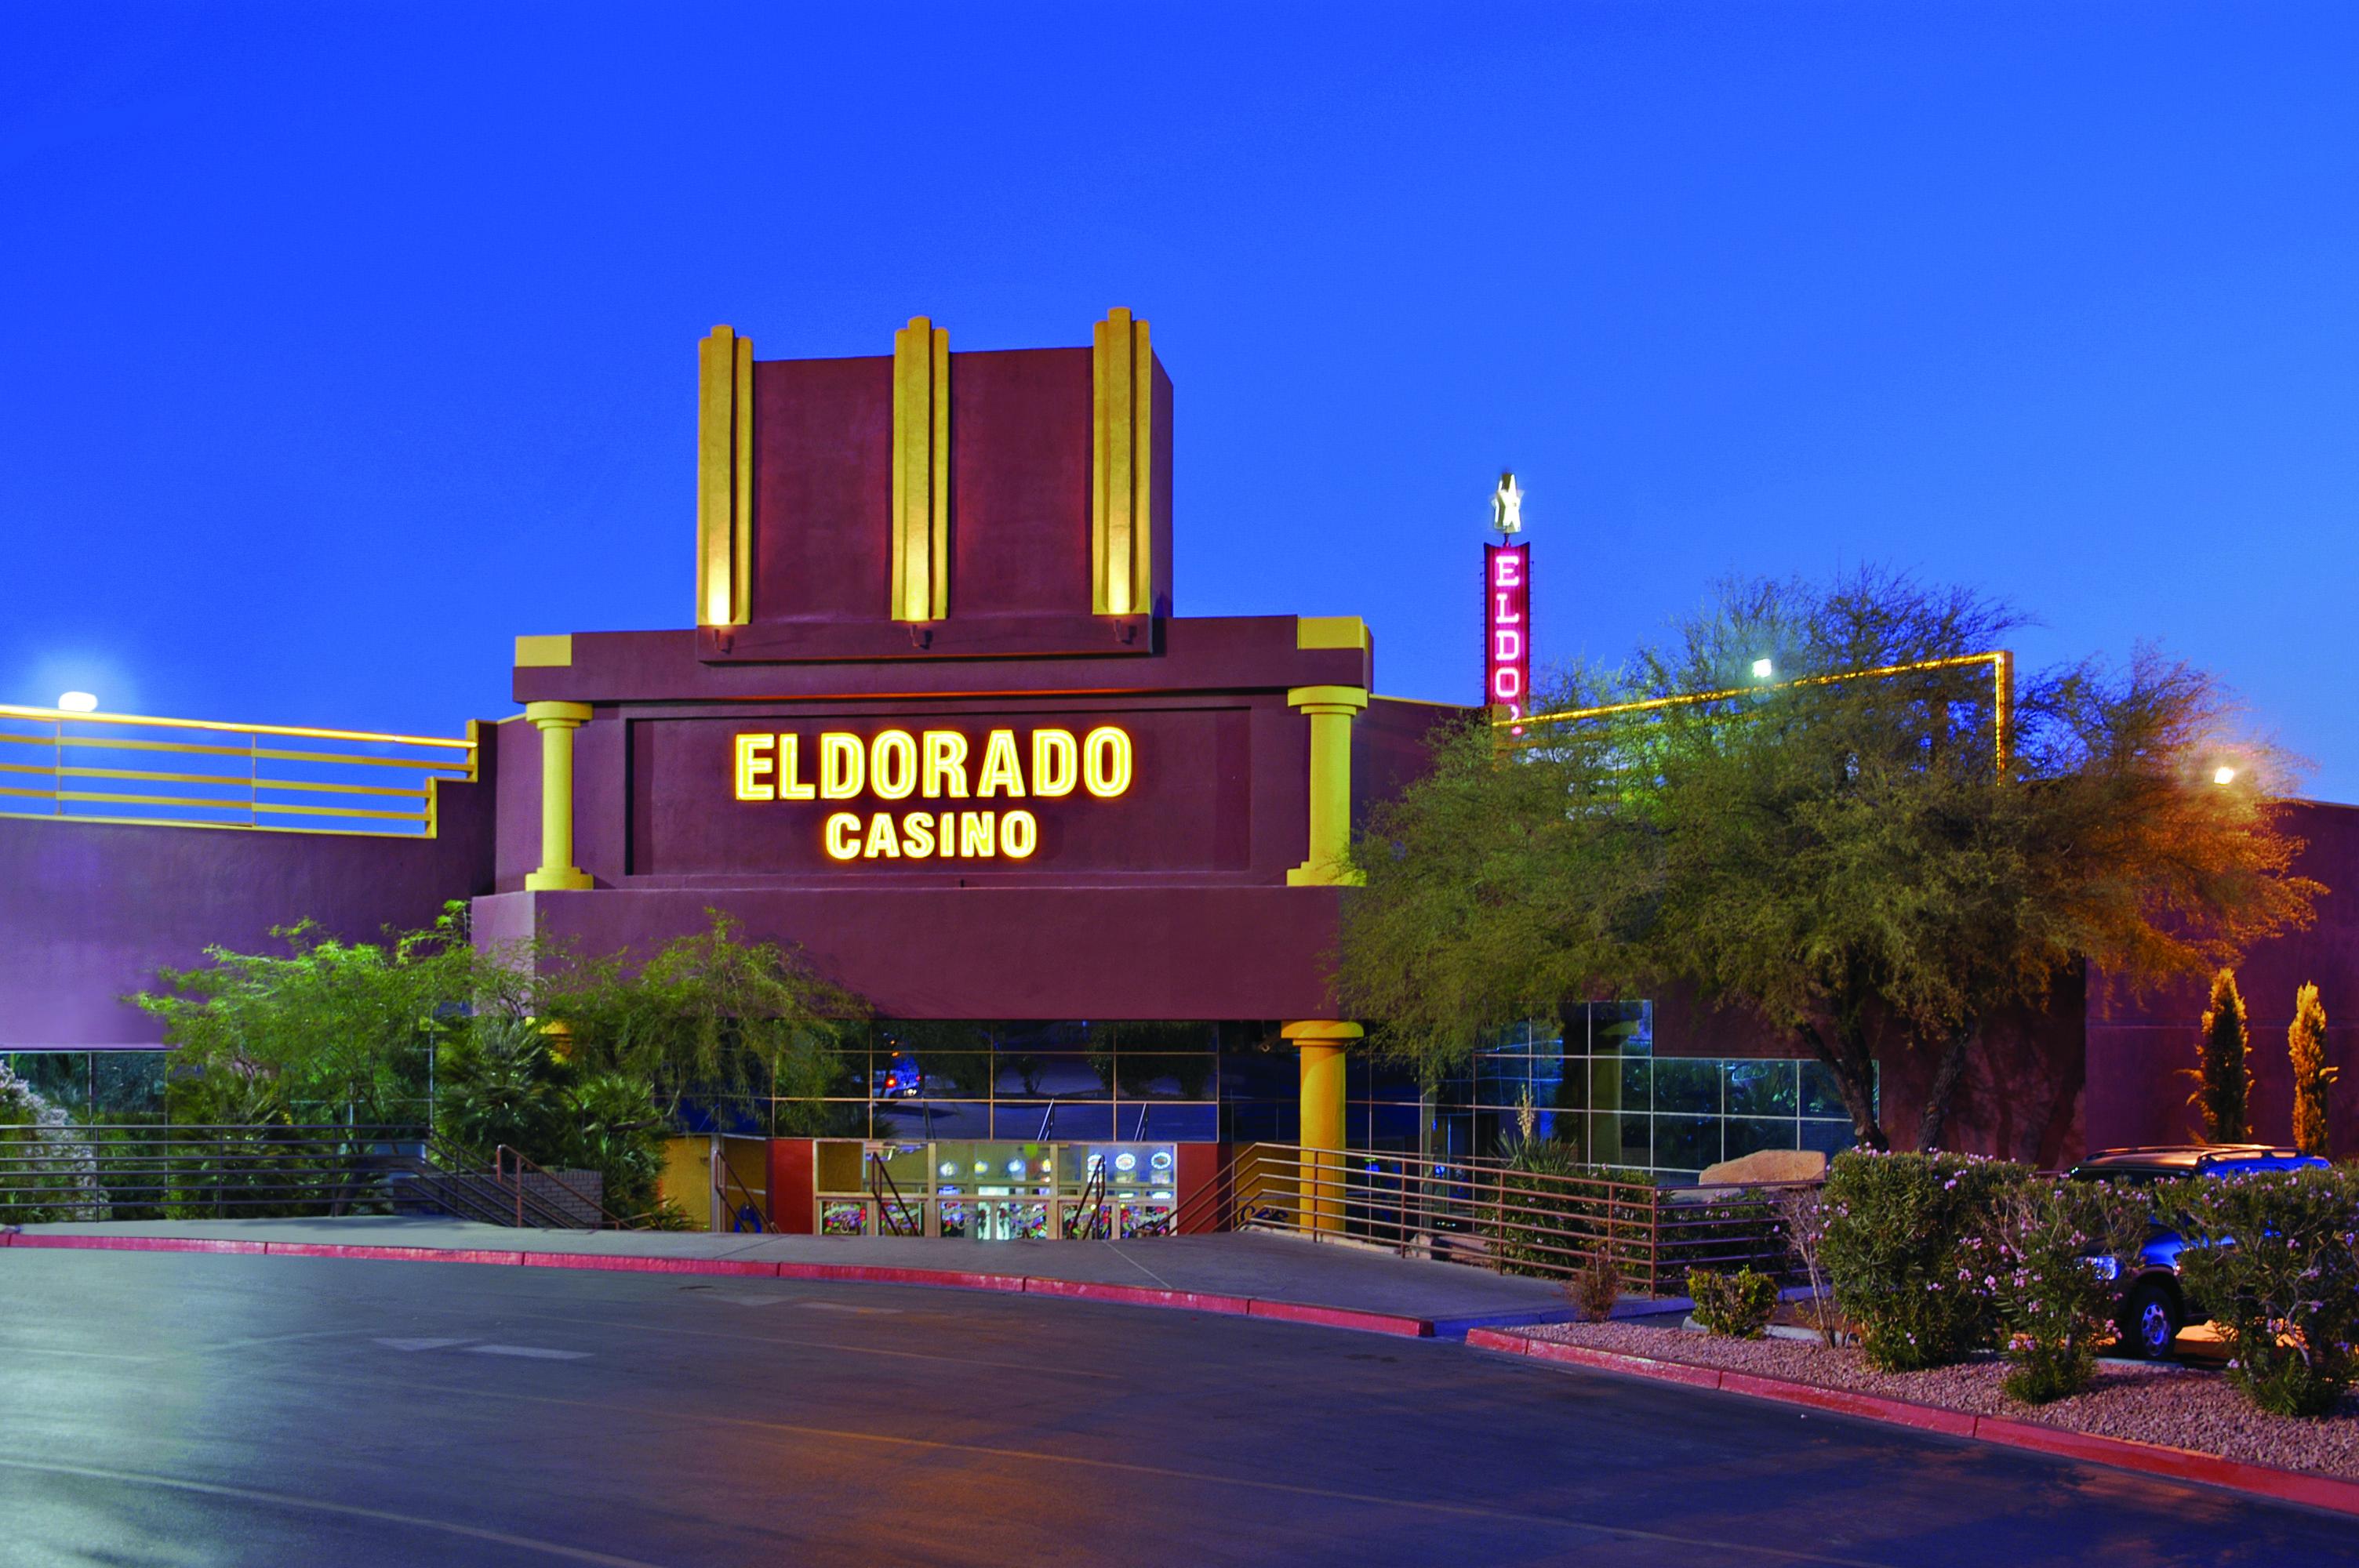 A casino at night